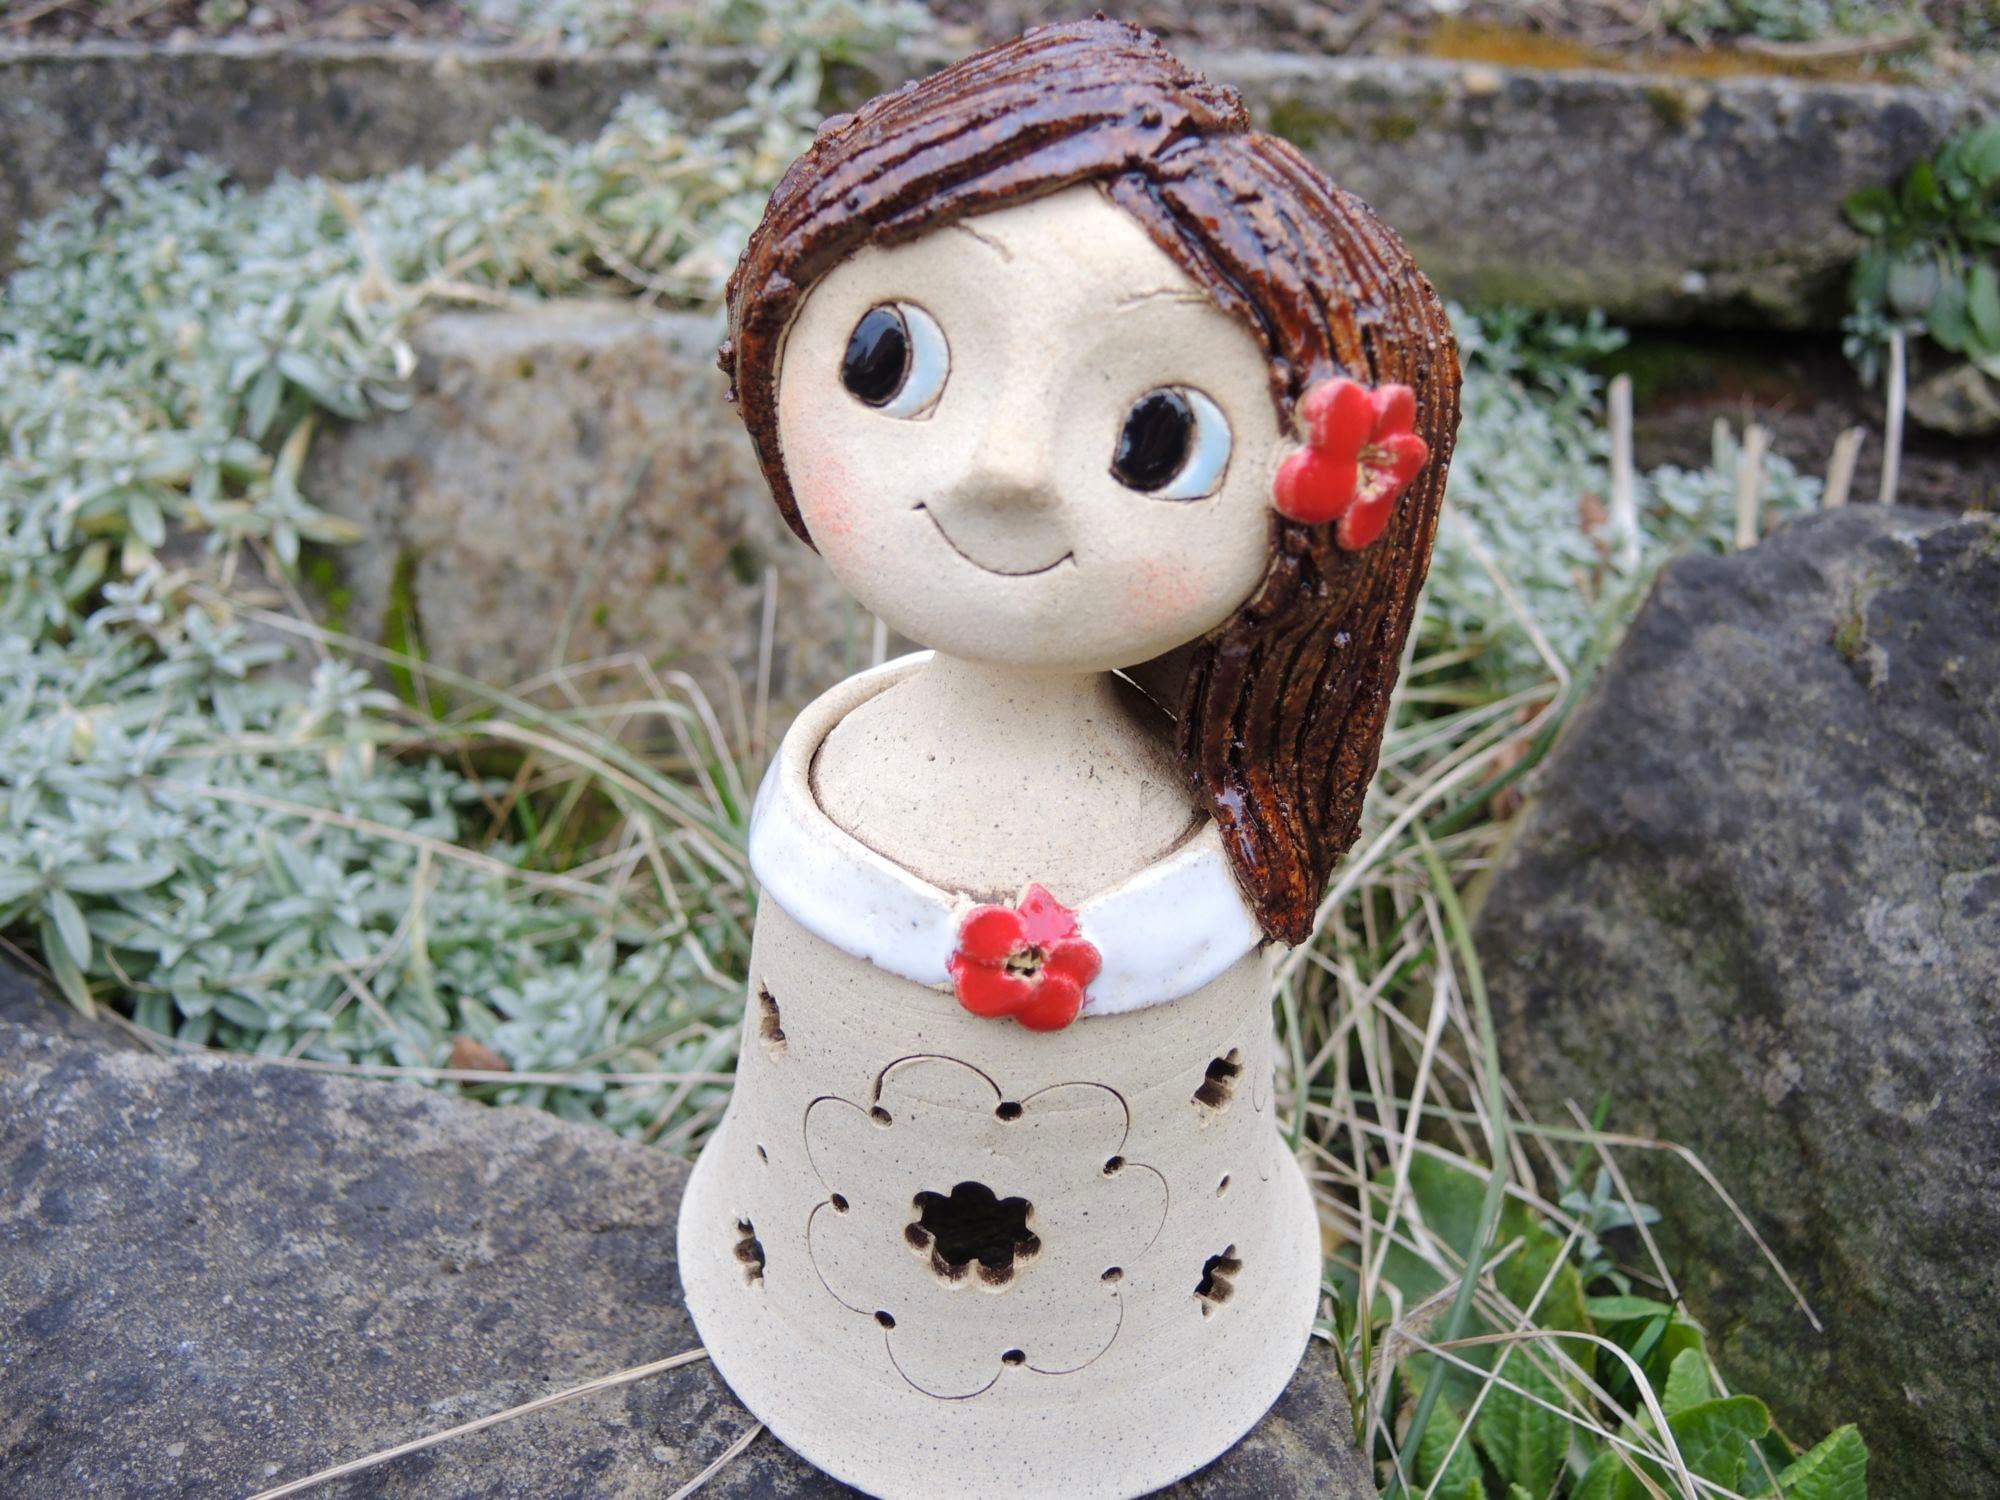 vila lampicka kvetina keramika andee